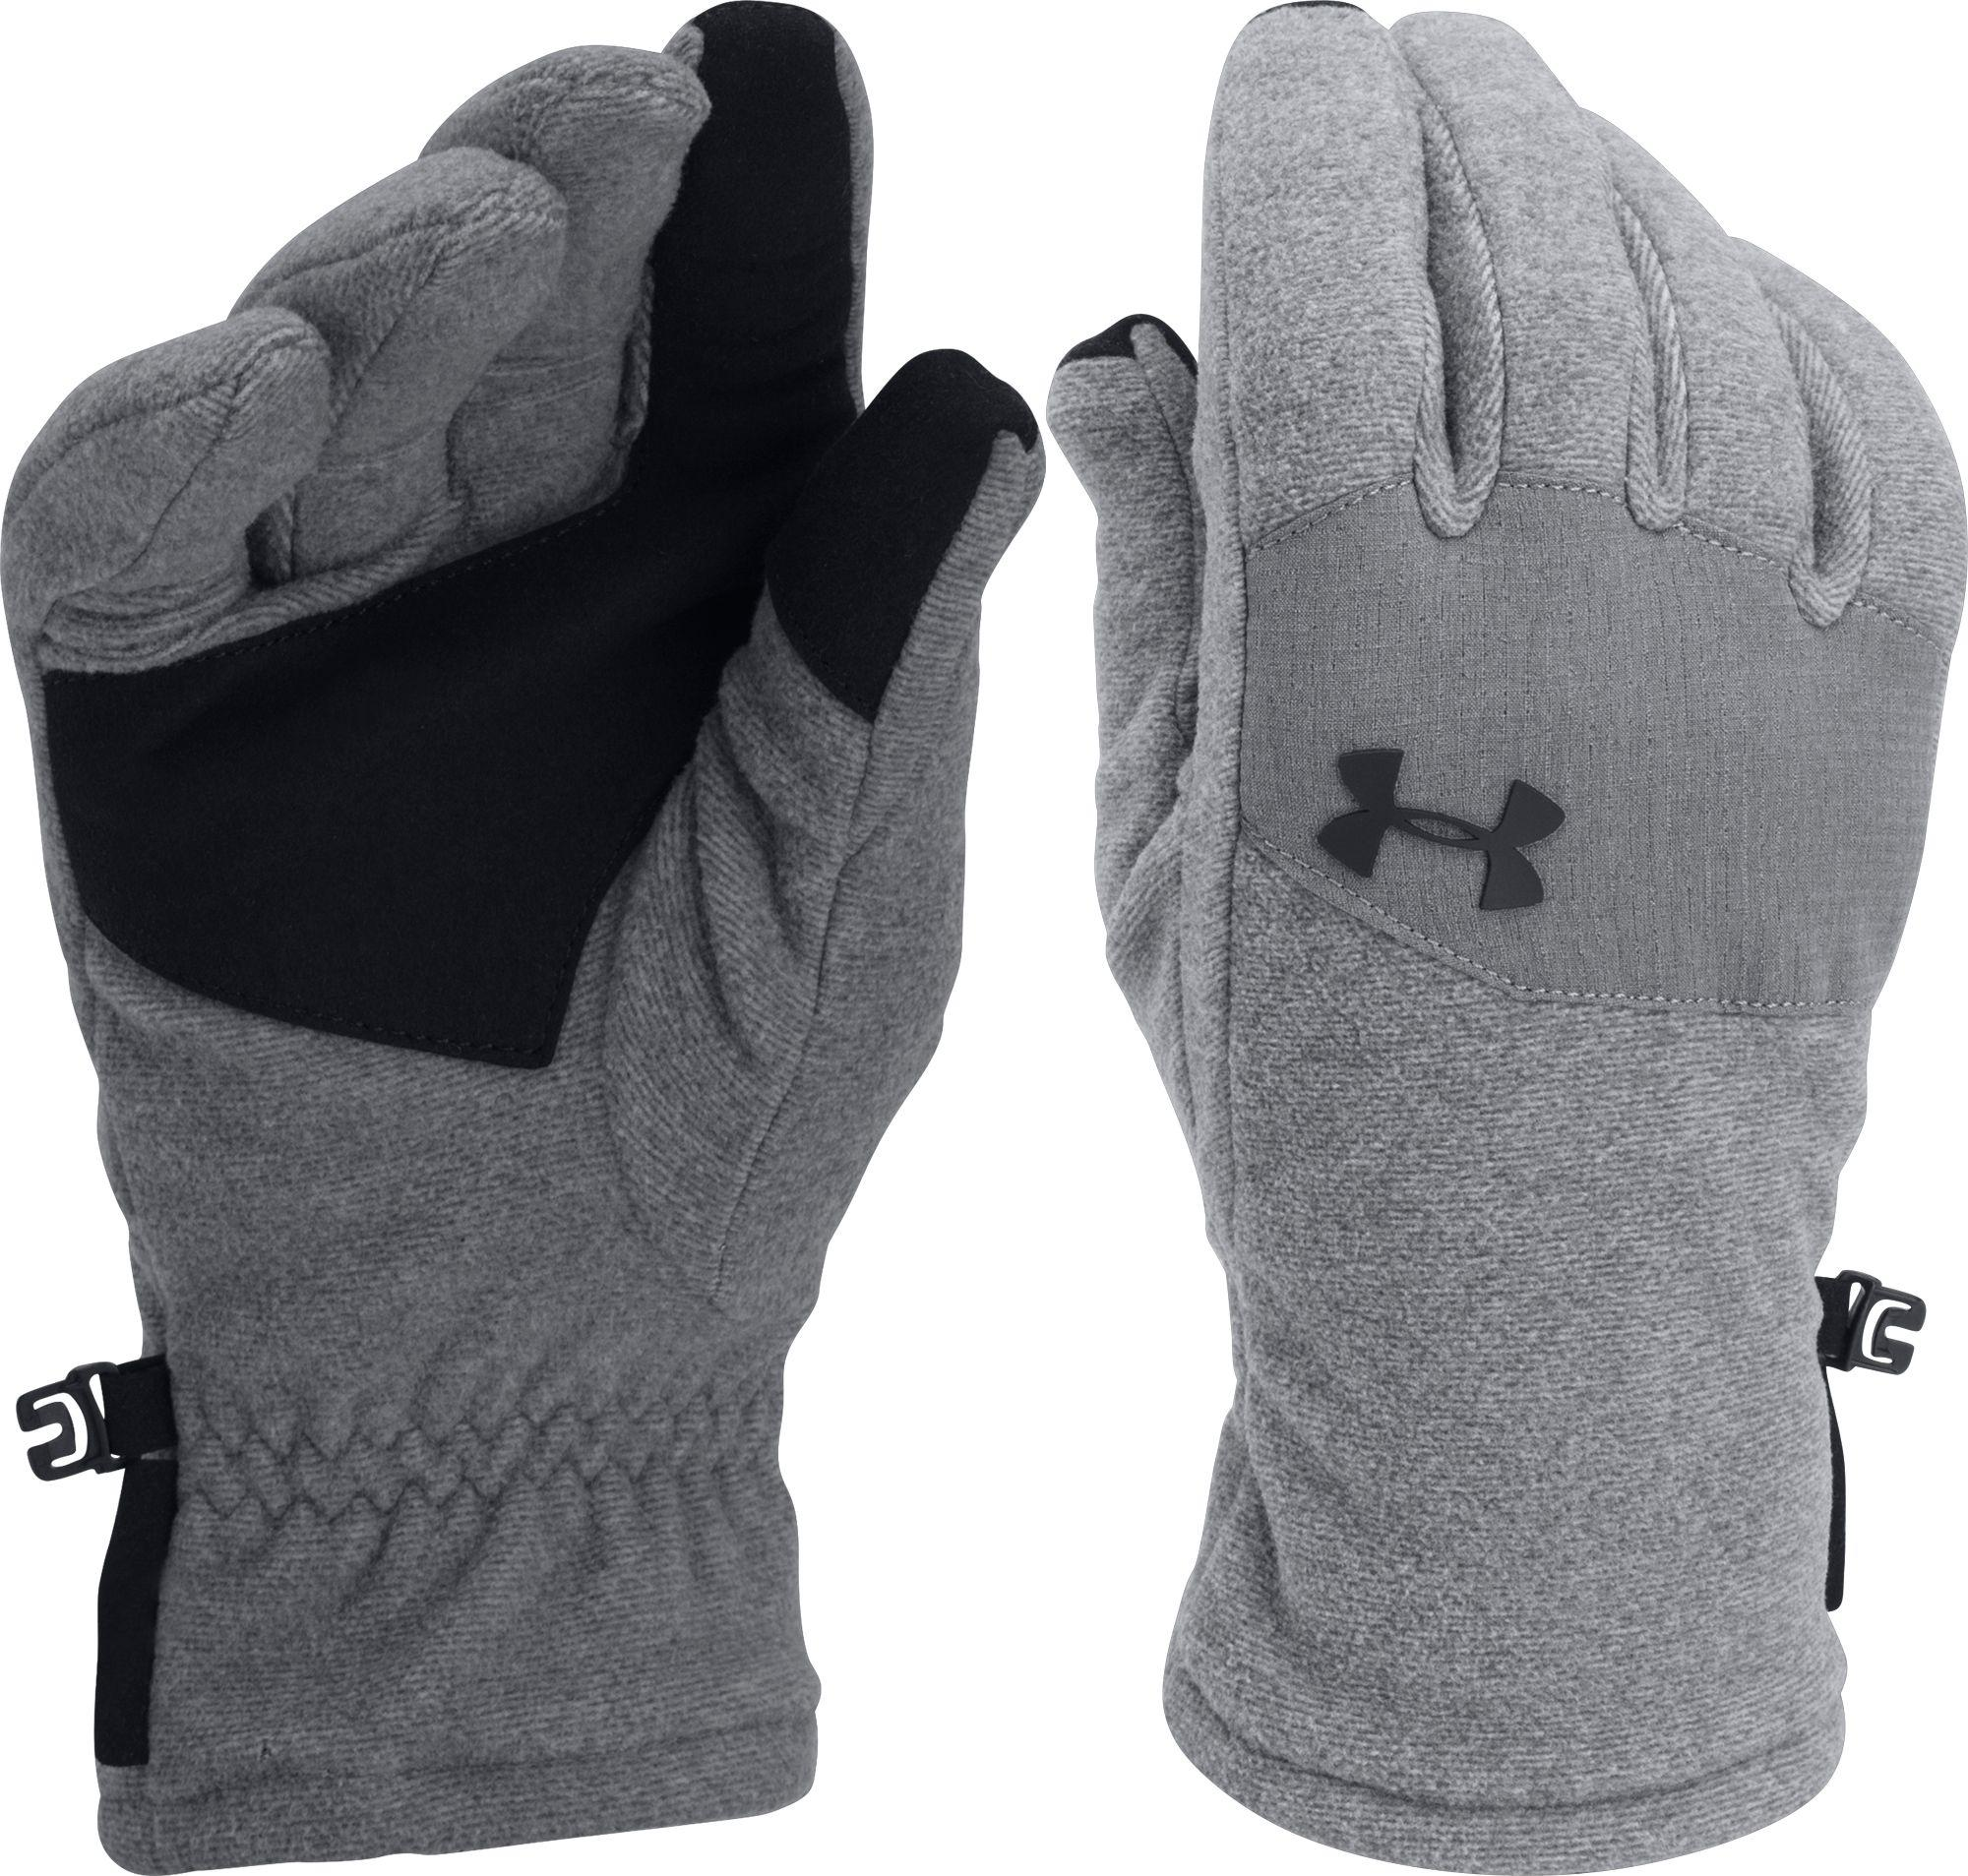 Under Armour   Black Coldgear Infrared Fleece Gloves 2.0 For Men   Lyst